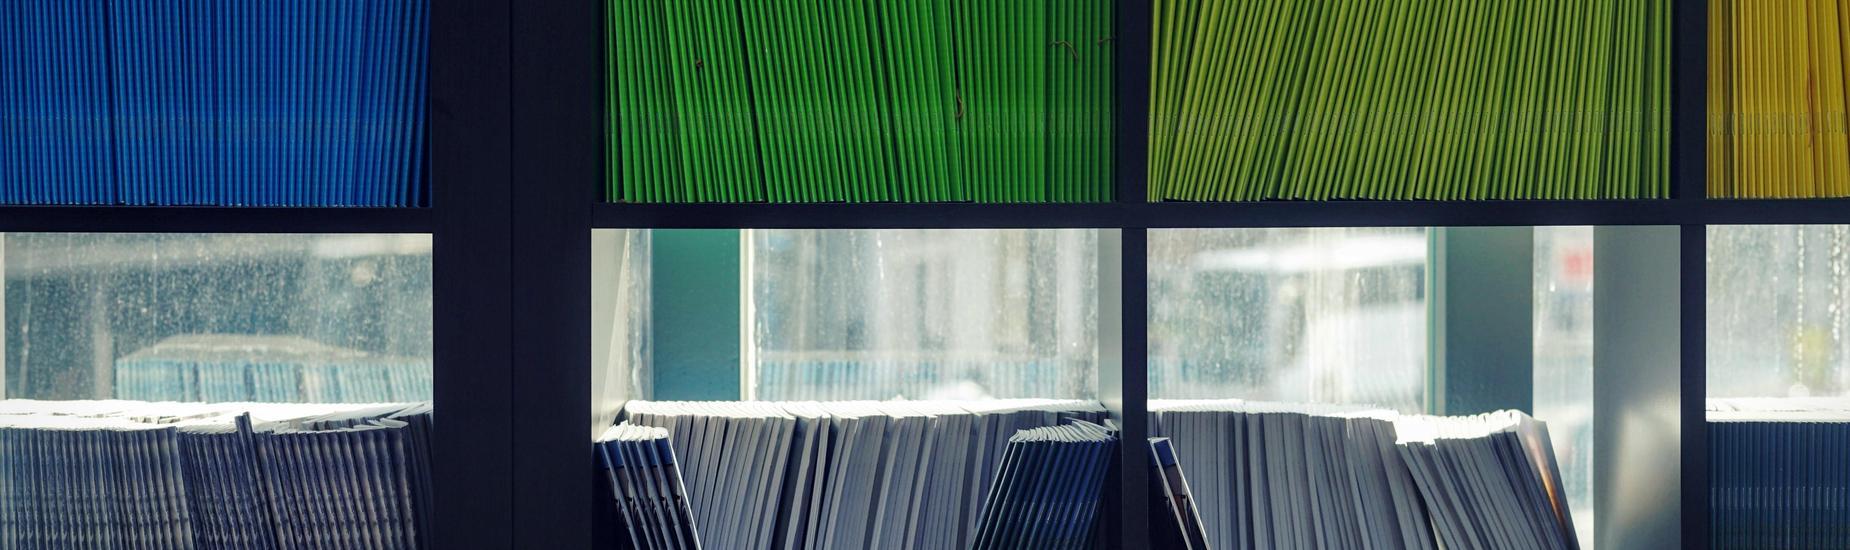 books in window